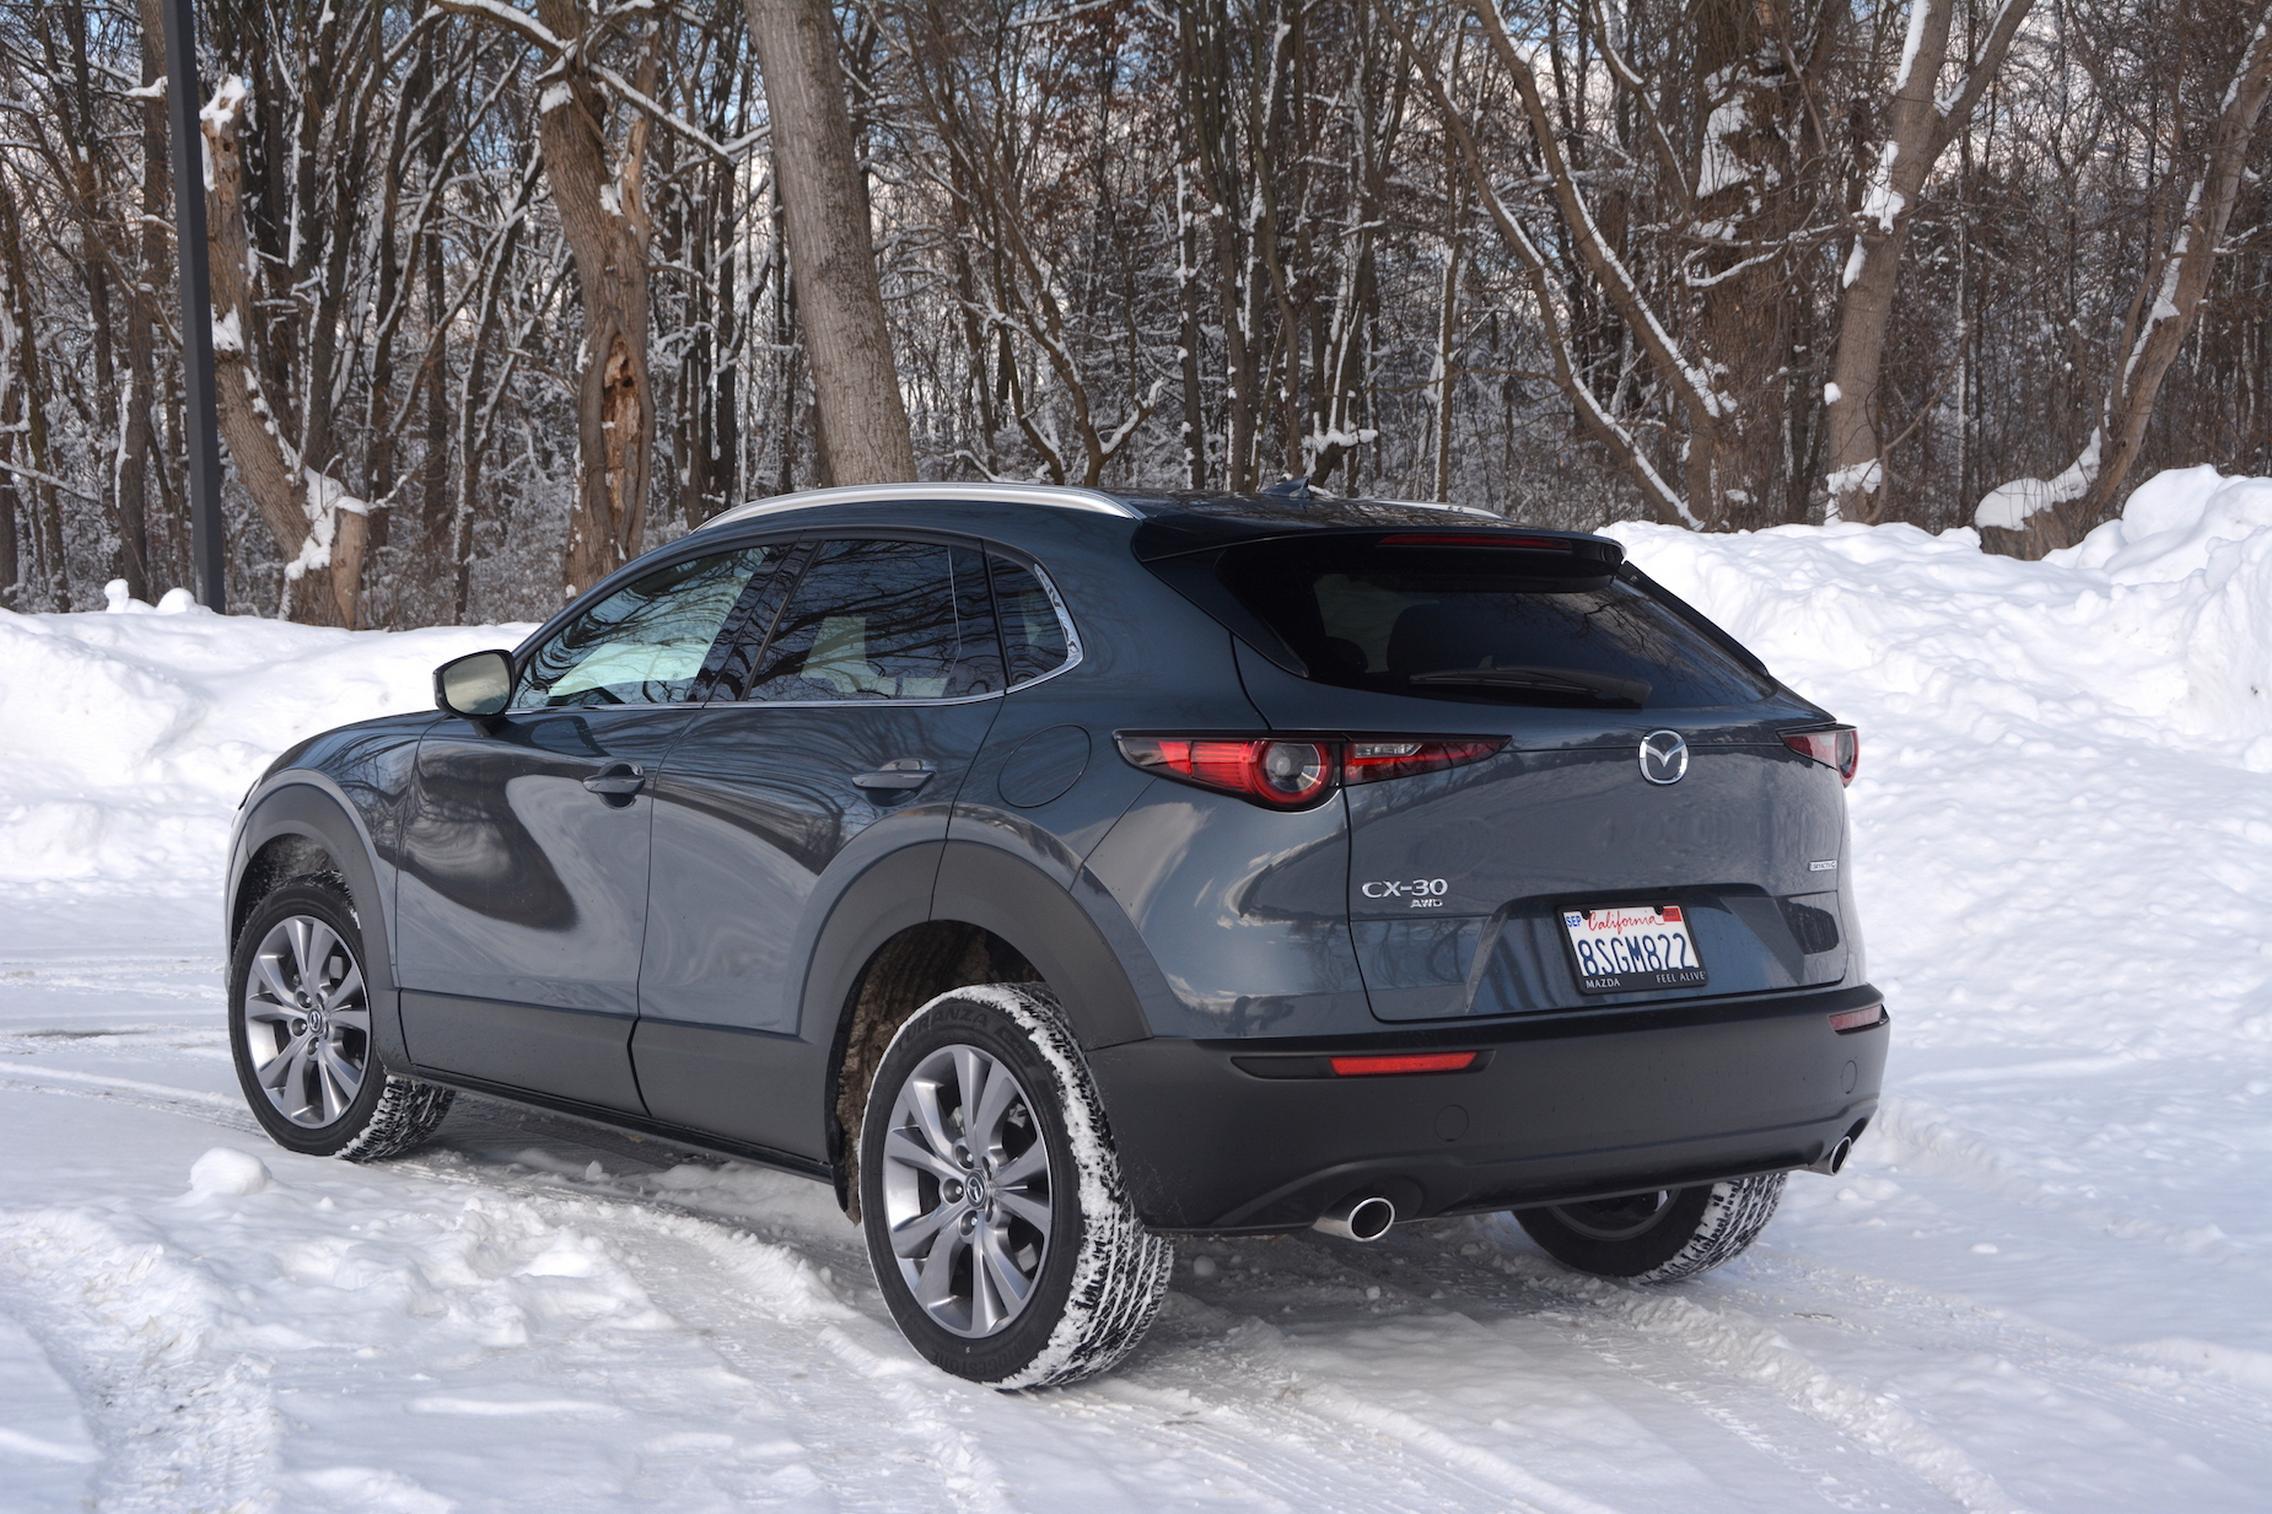 Mazda CX-30 AWD rear